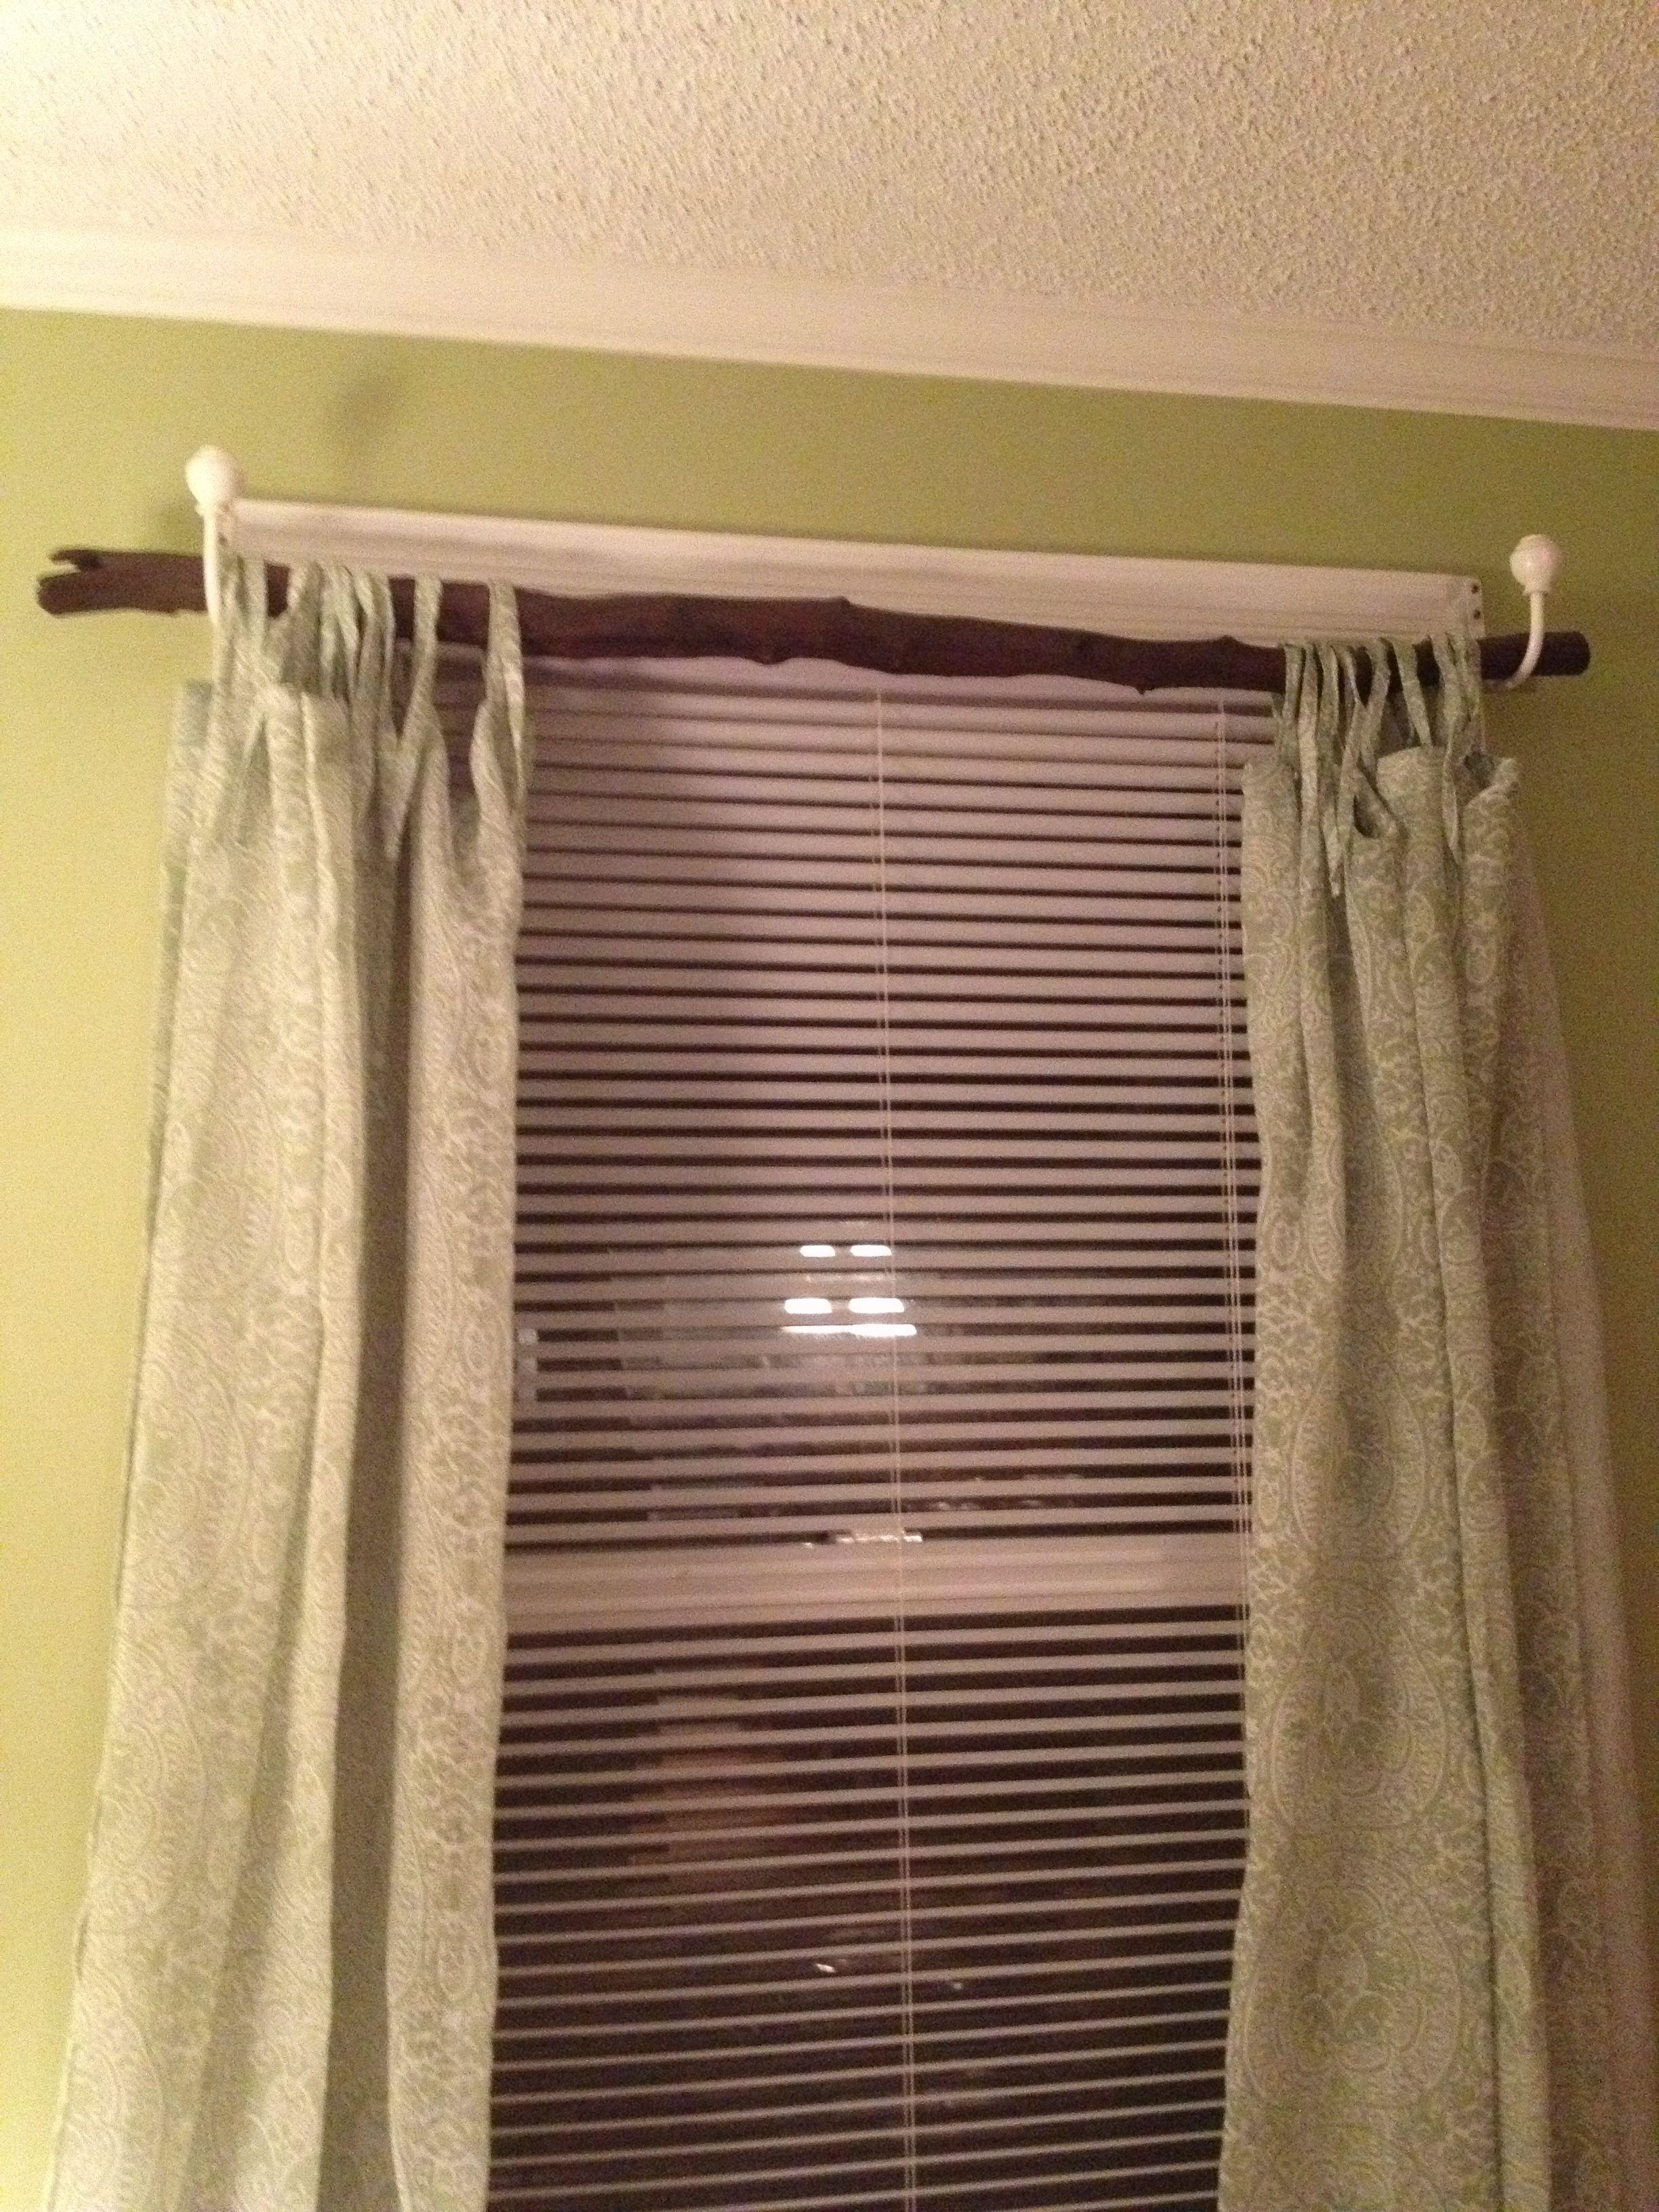 Tree Branch Curtain Rod Perde